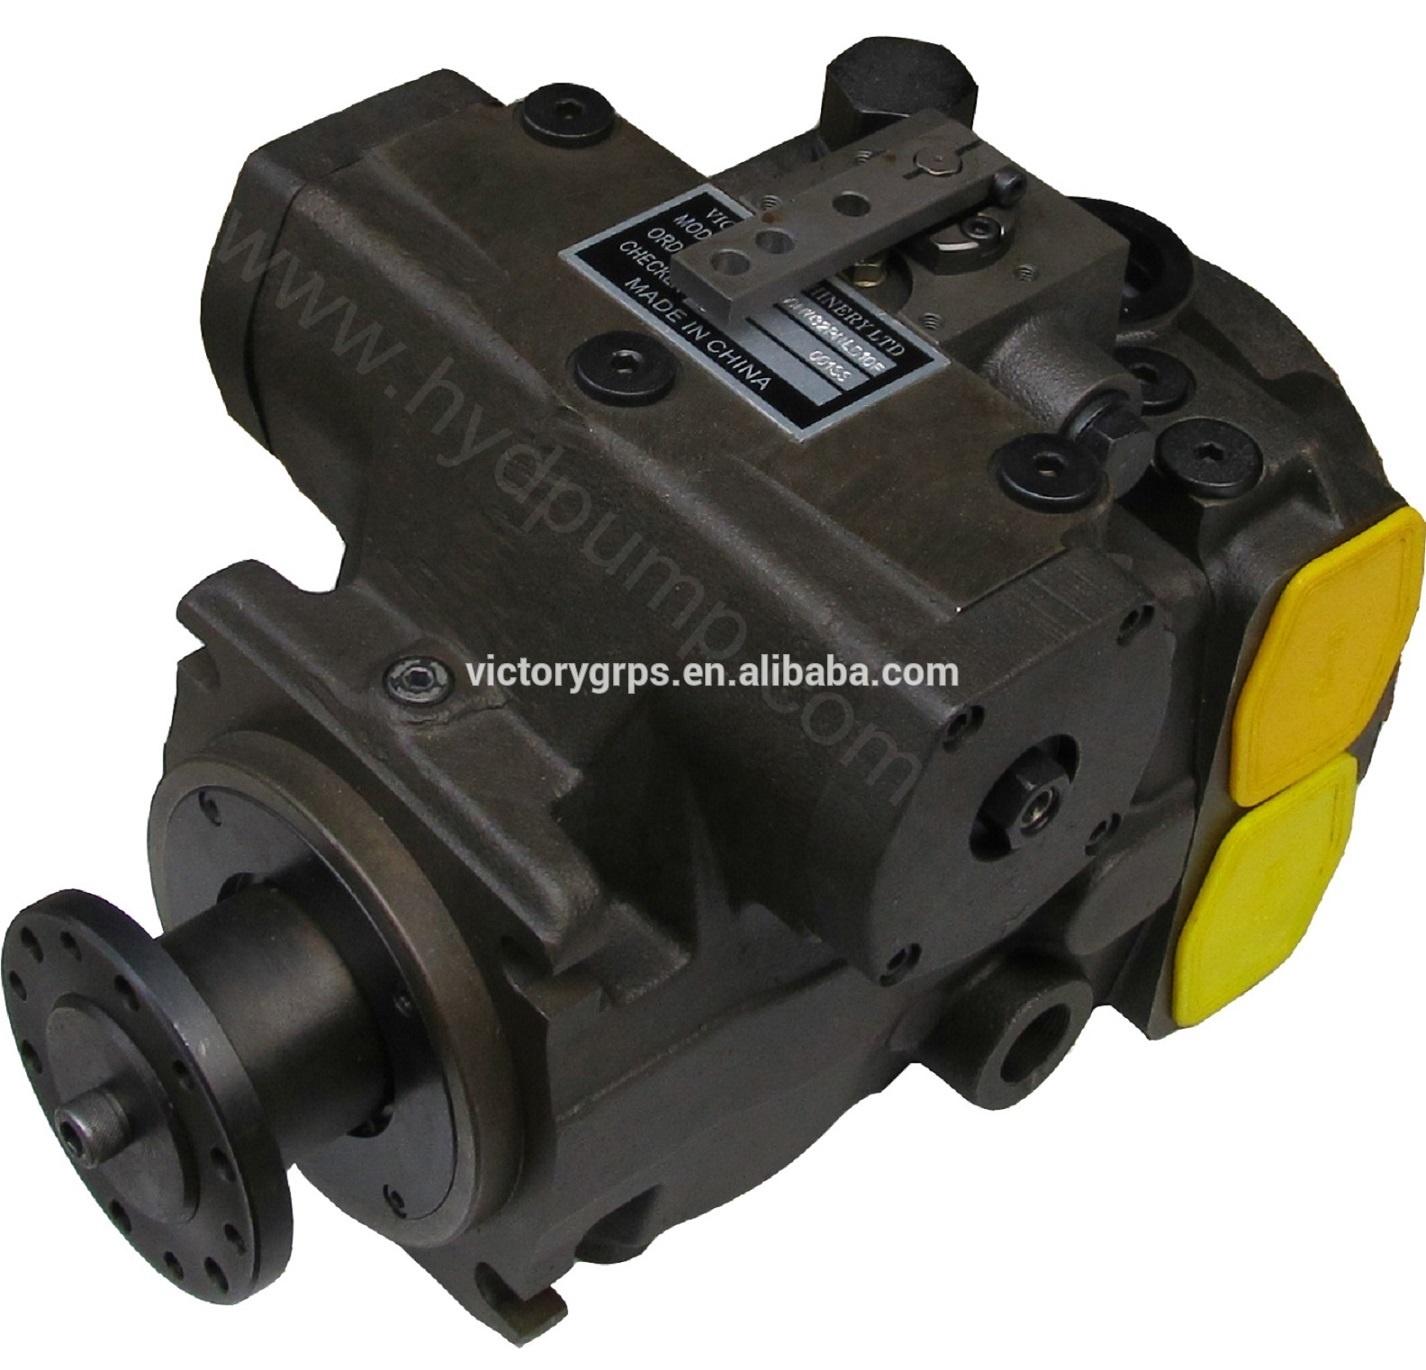 Hydromatik Mannesmann A4VTG90HW/32R-NLD10F001S-S A4VTG71 A4VTG90 A4VTG Concrete Rexroth Mixer Pump